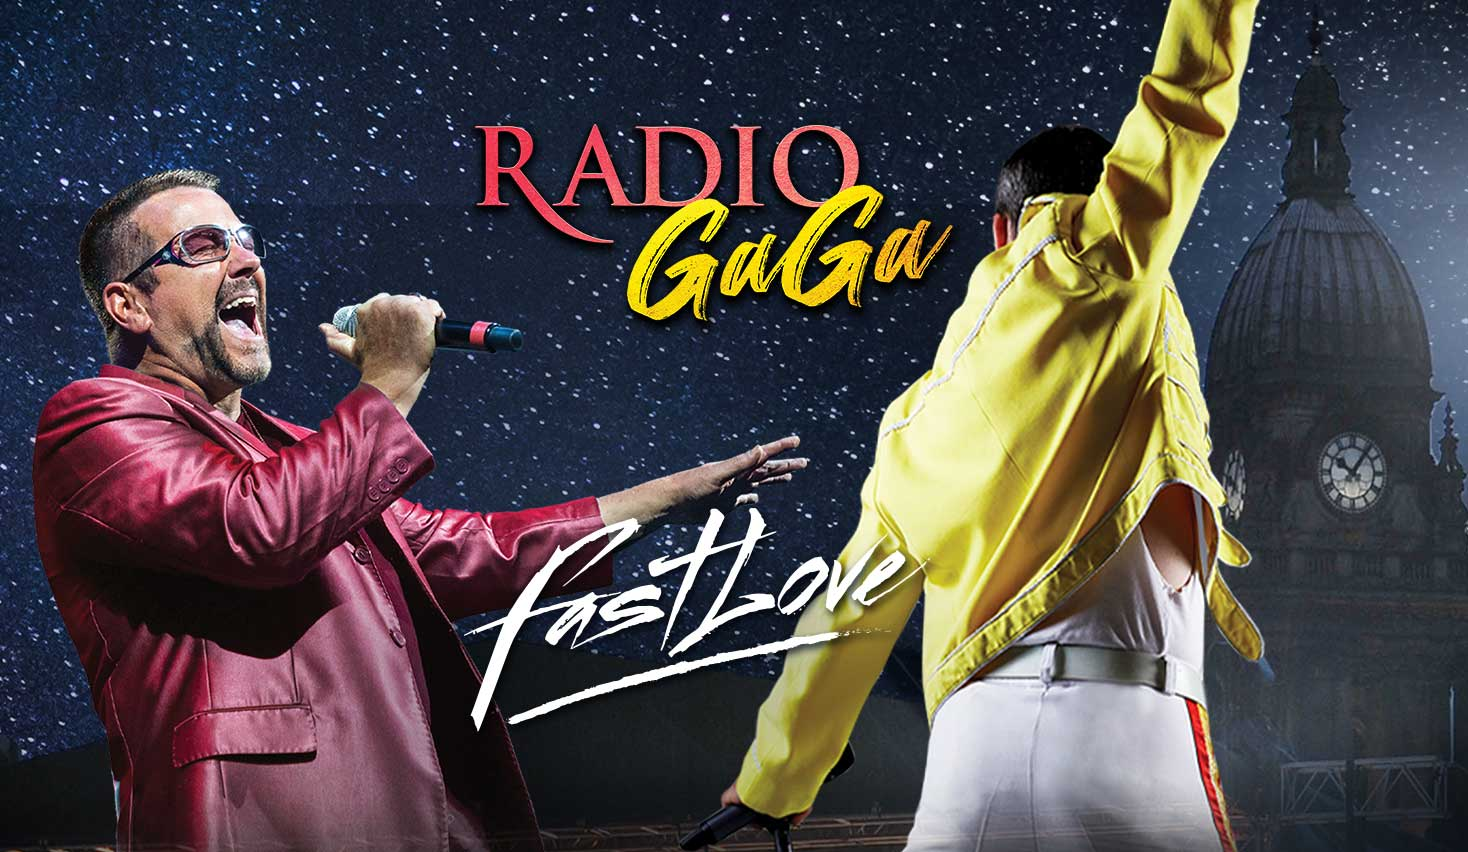 One Night Under The Stars ft. Radio Gaga & Fastlove